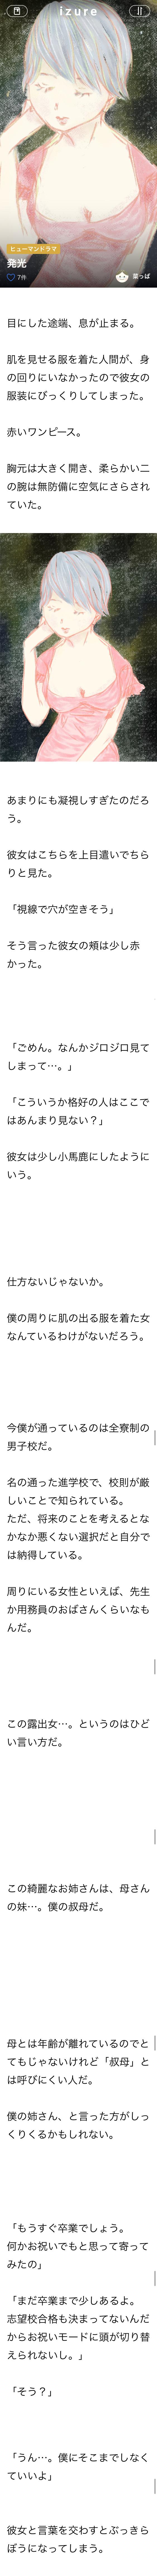 nappa_1.jpg